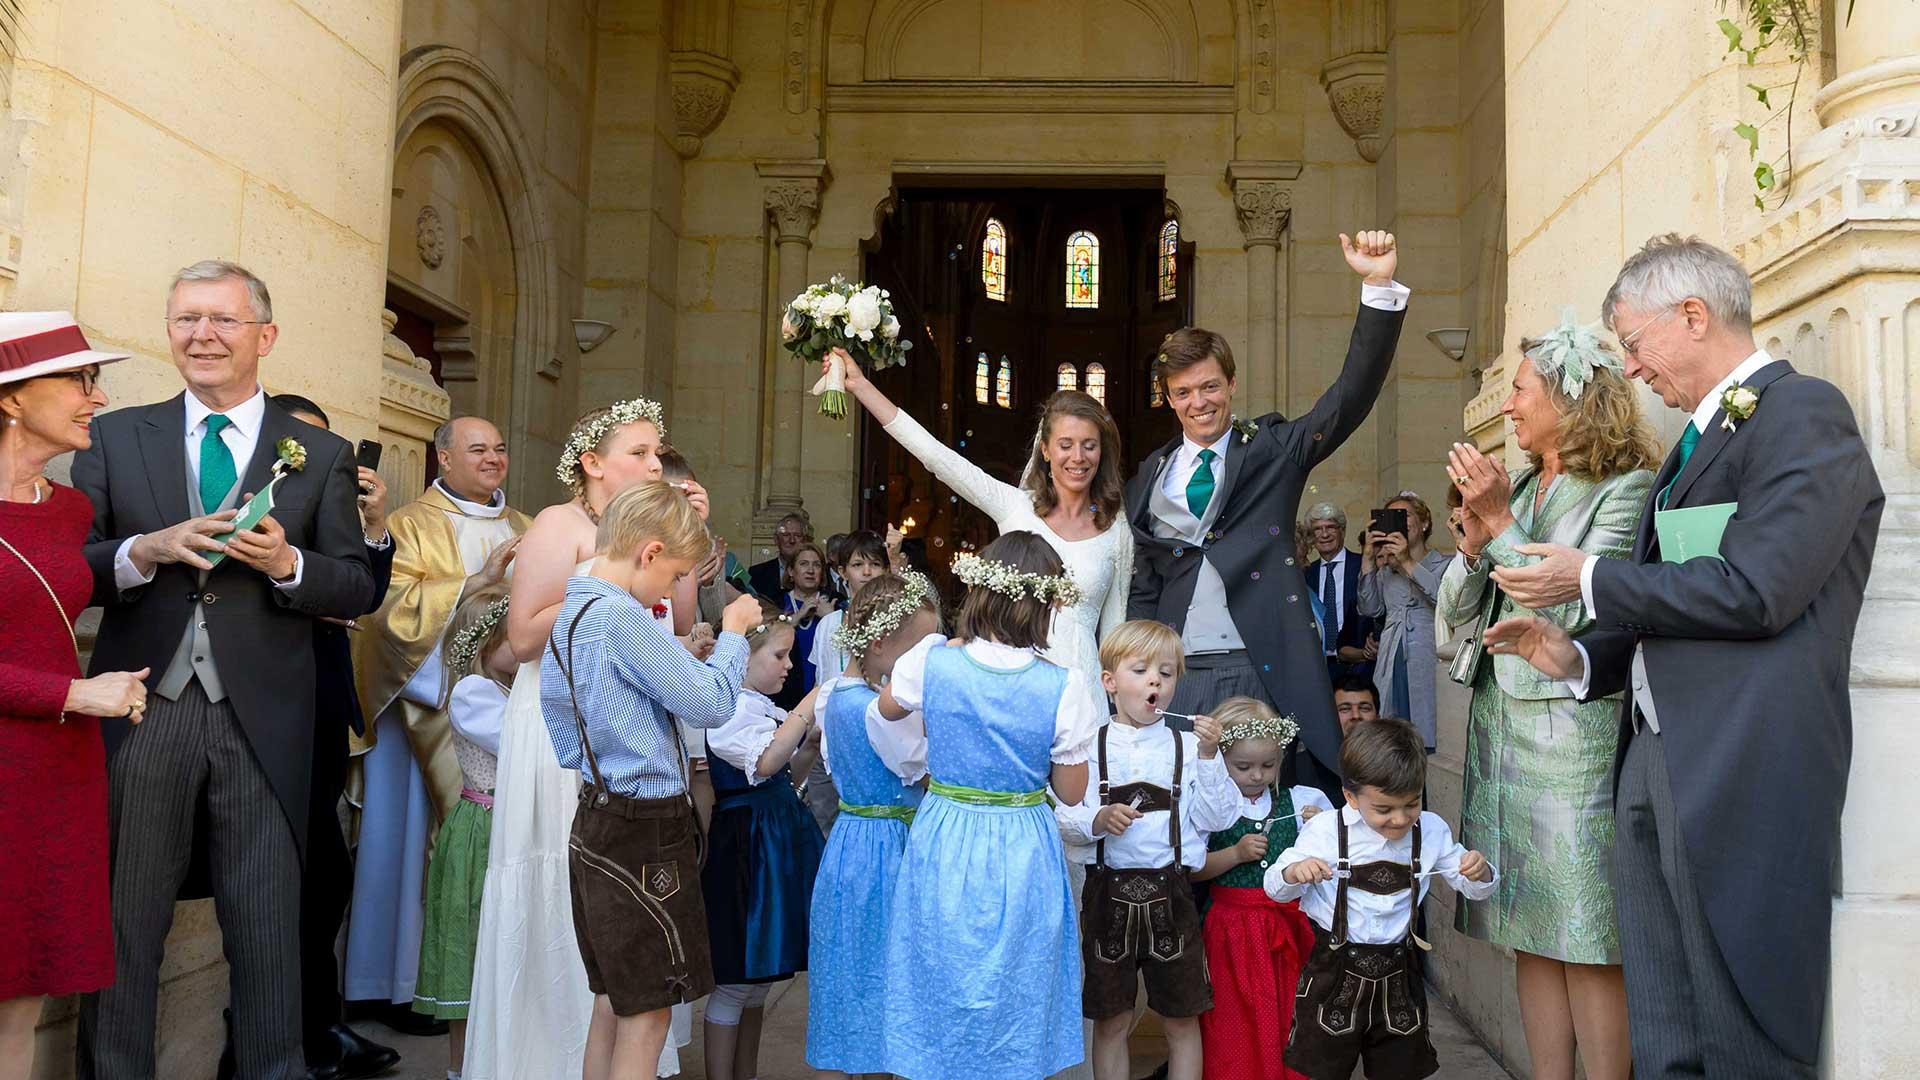 photographe-mariage-ile-de-france-31